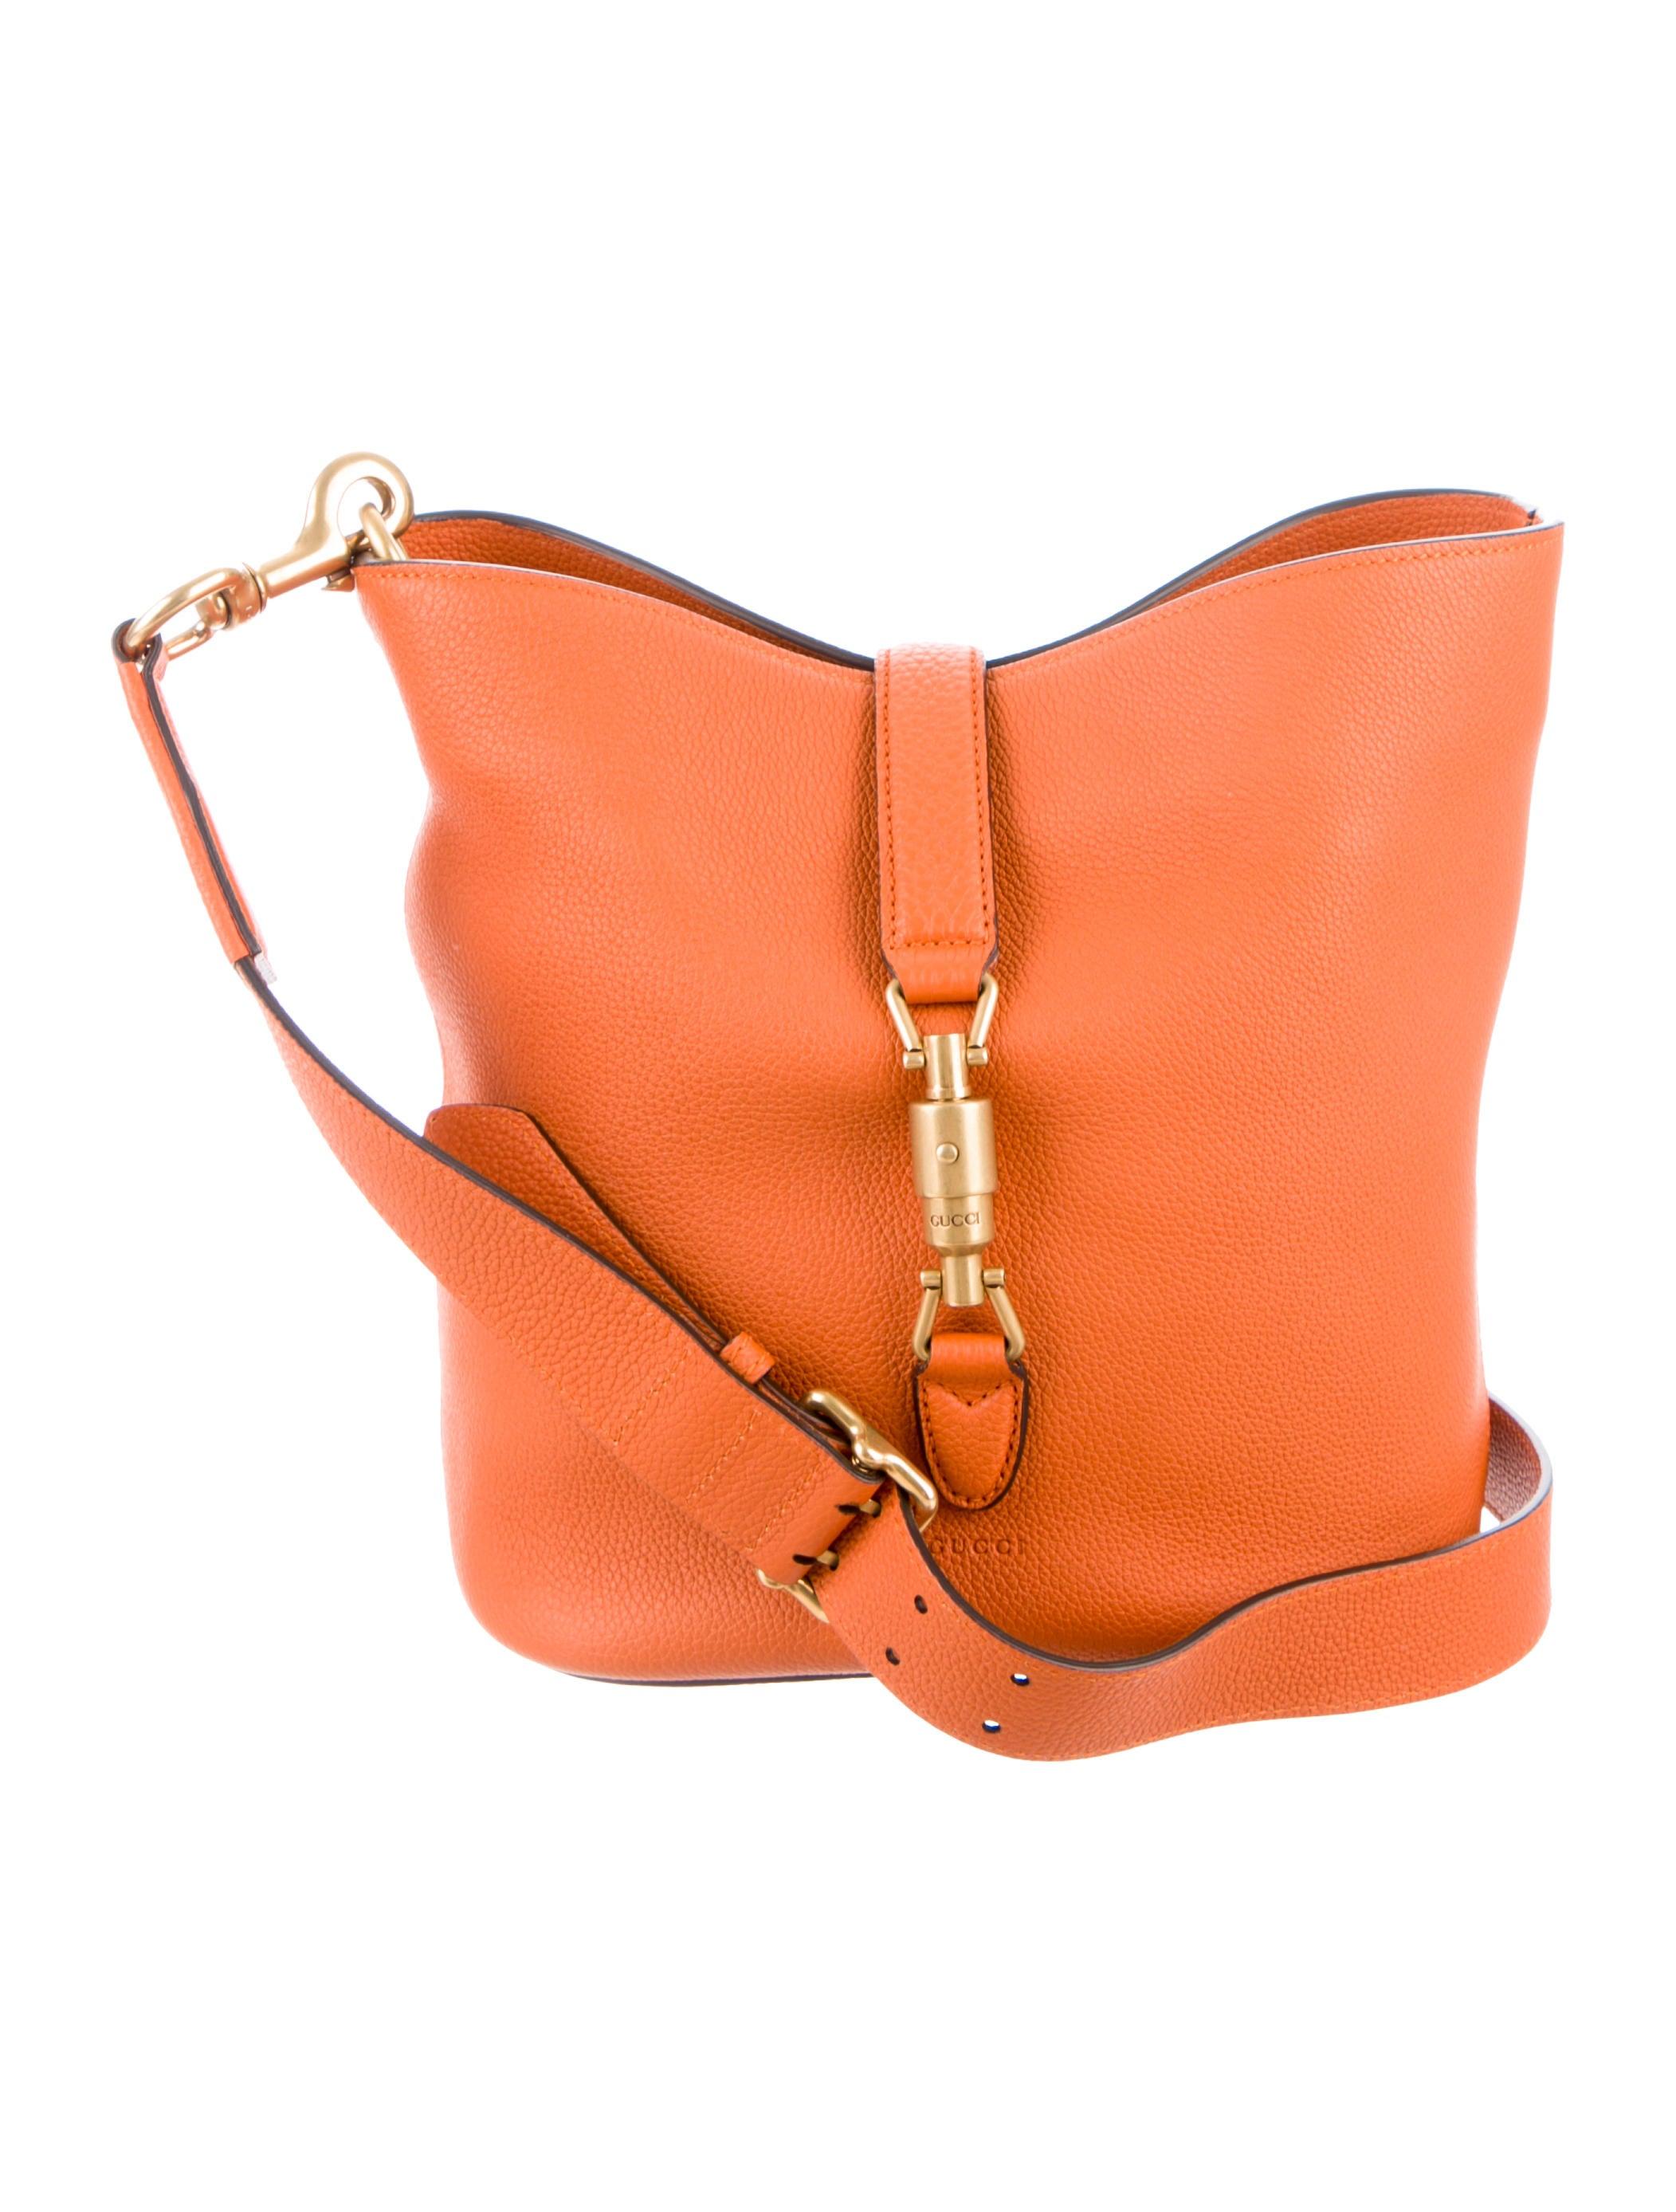 864346601d3 Gucci Jackie Soft Leather Bucket Bag - Handbags - GUC84620